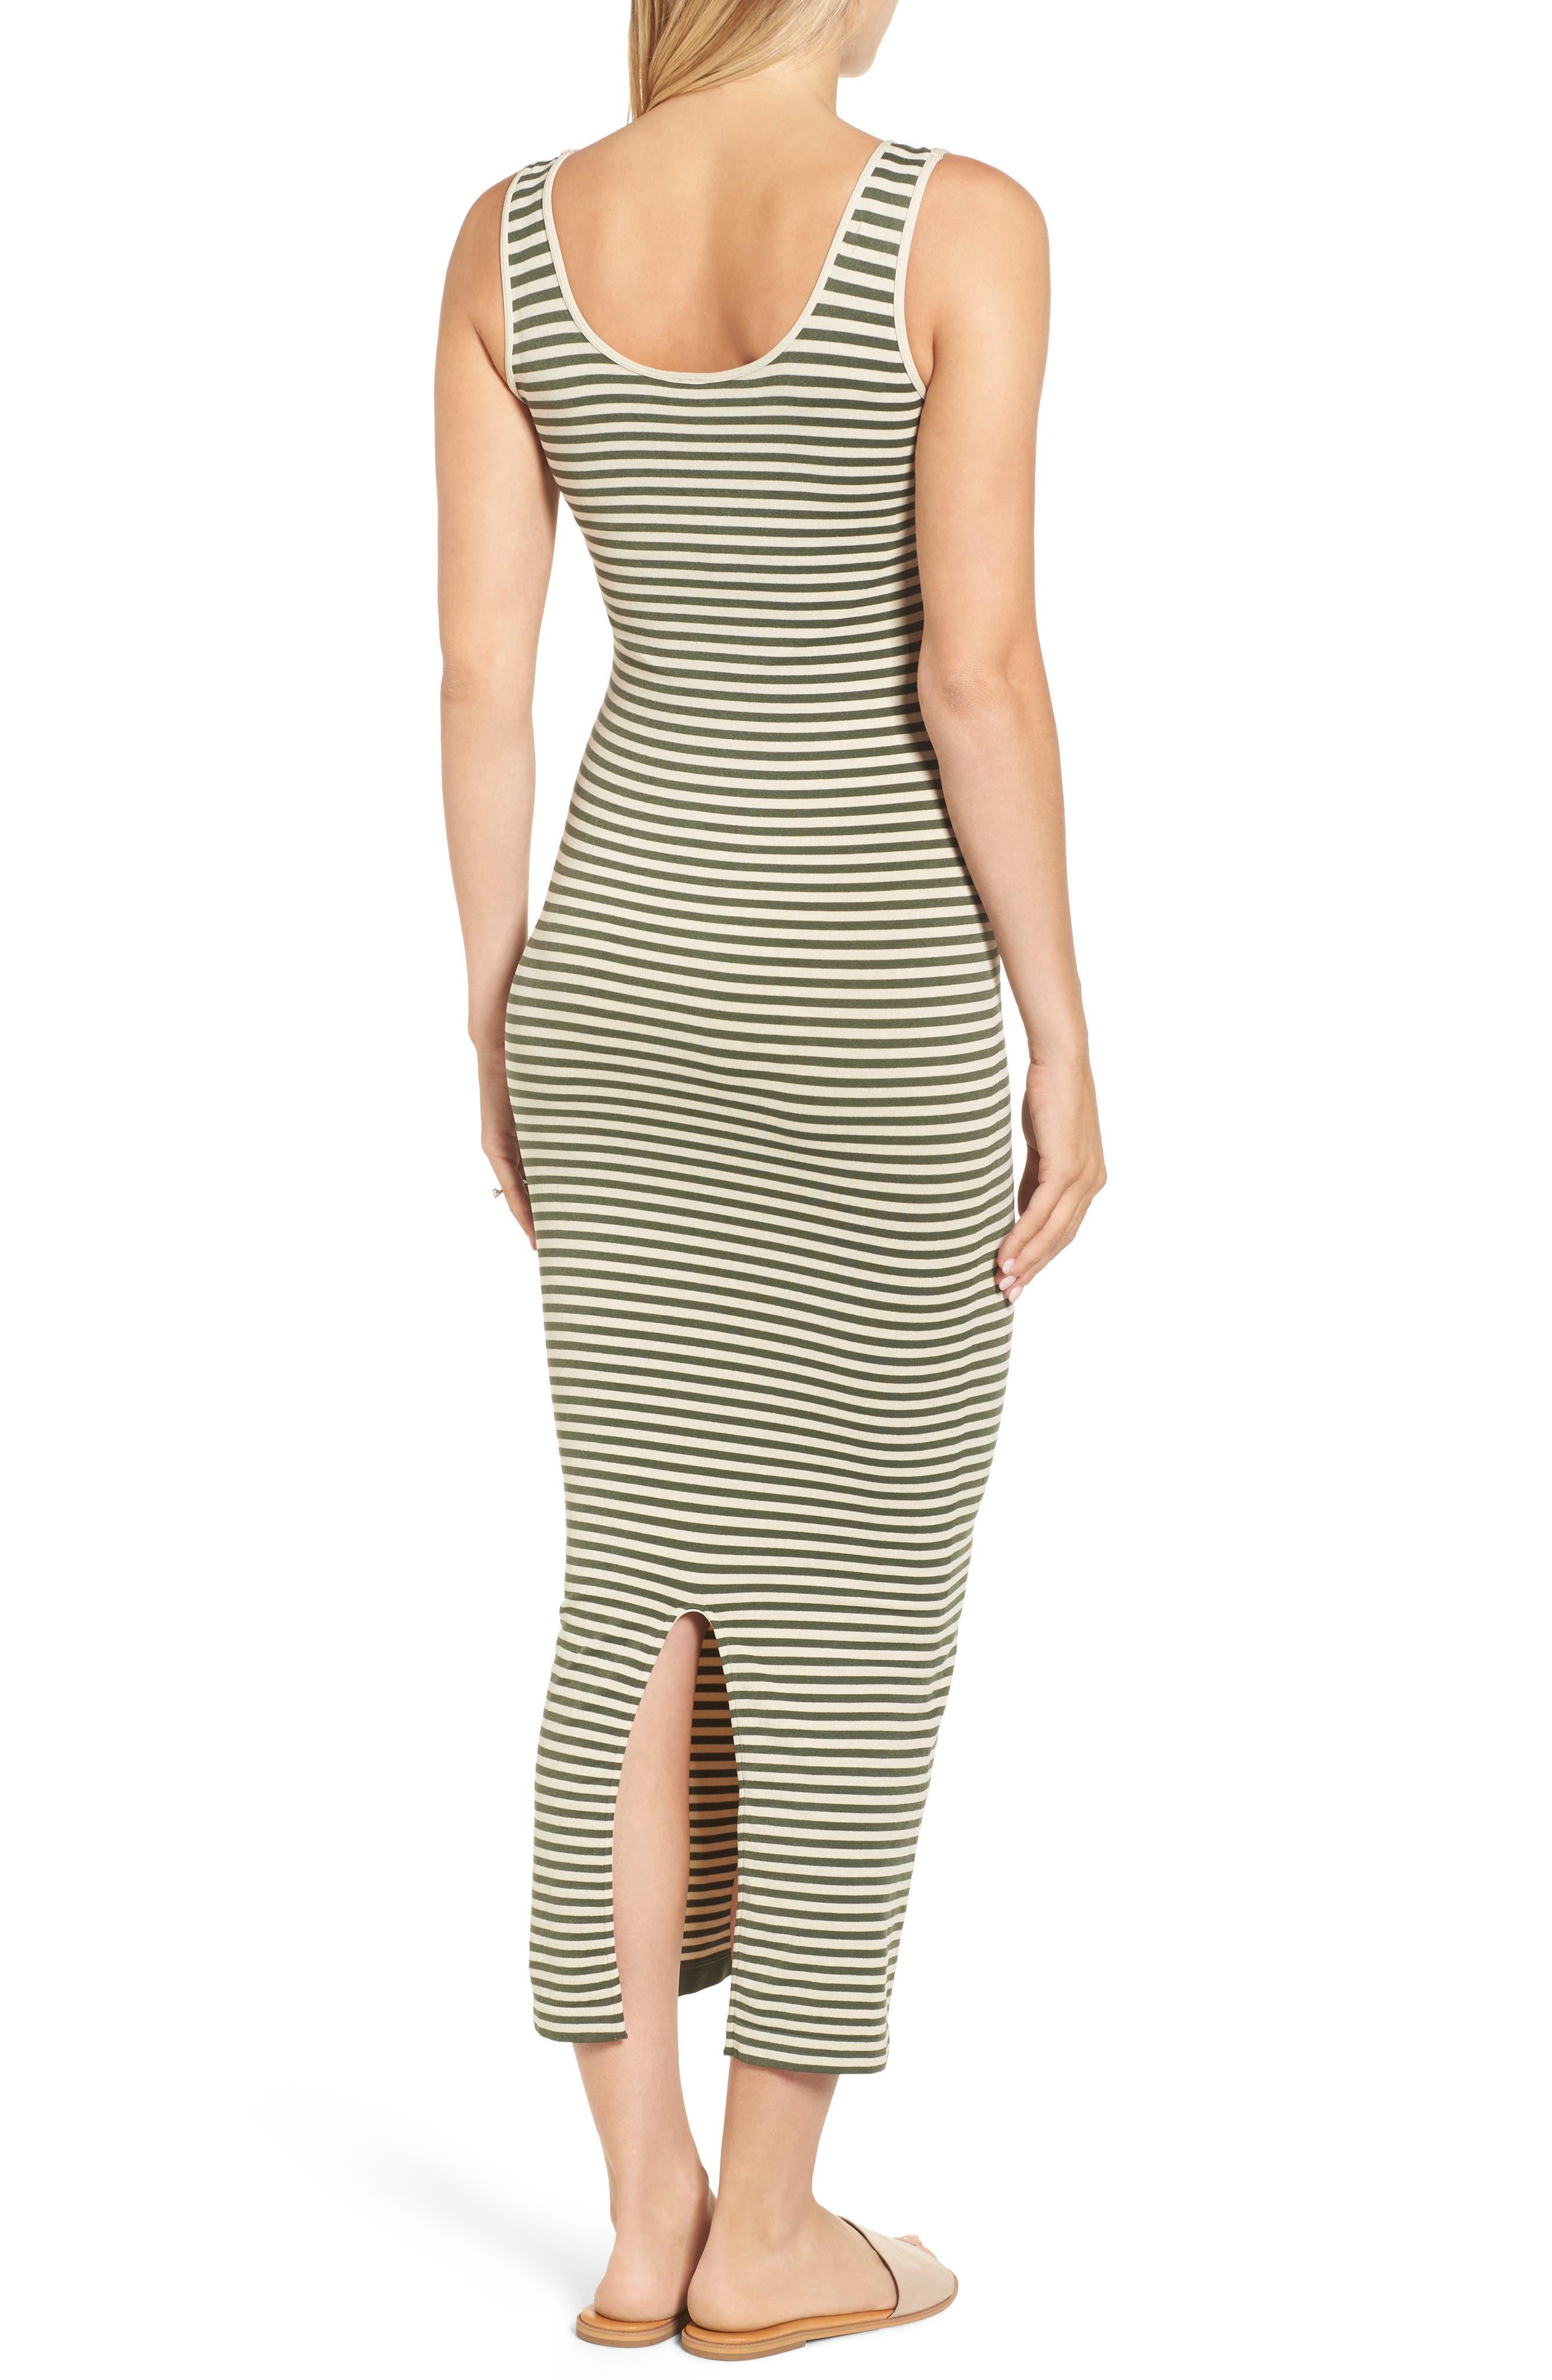 Micro Stripe Maternity Dress,                             Alternate thumbnail 2, color,                             Oatmeal/ Olive